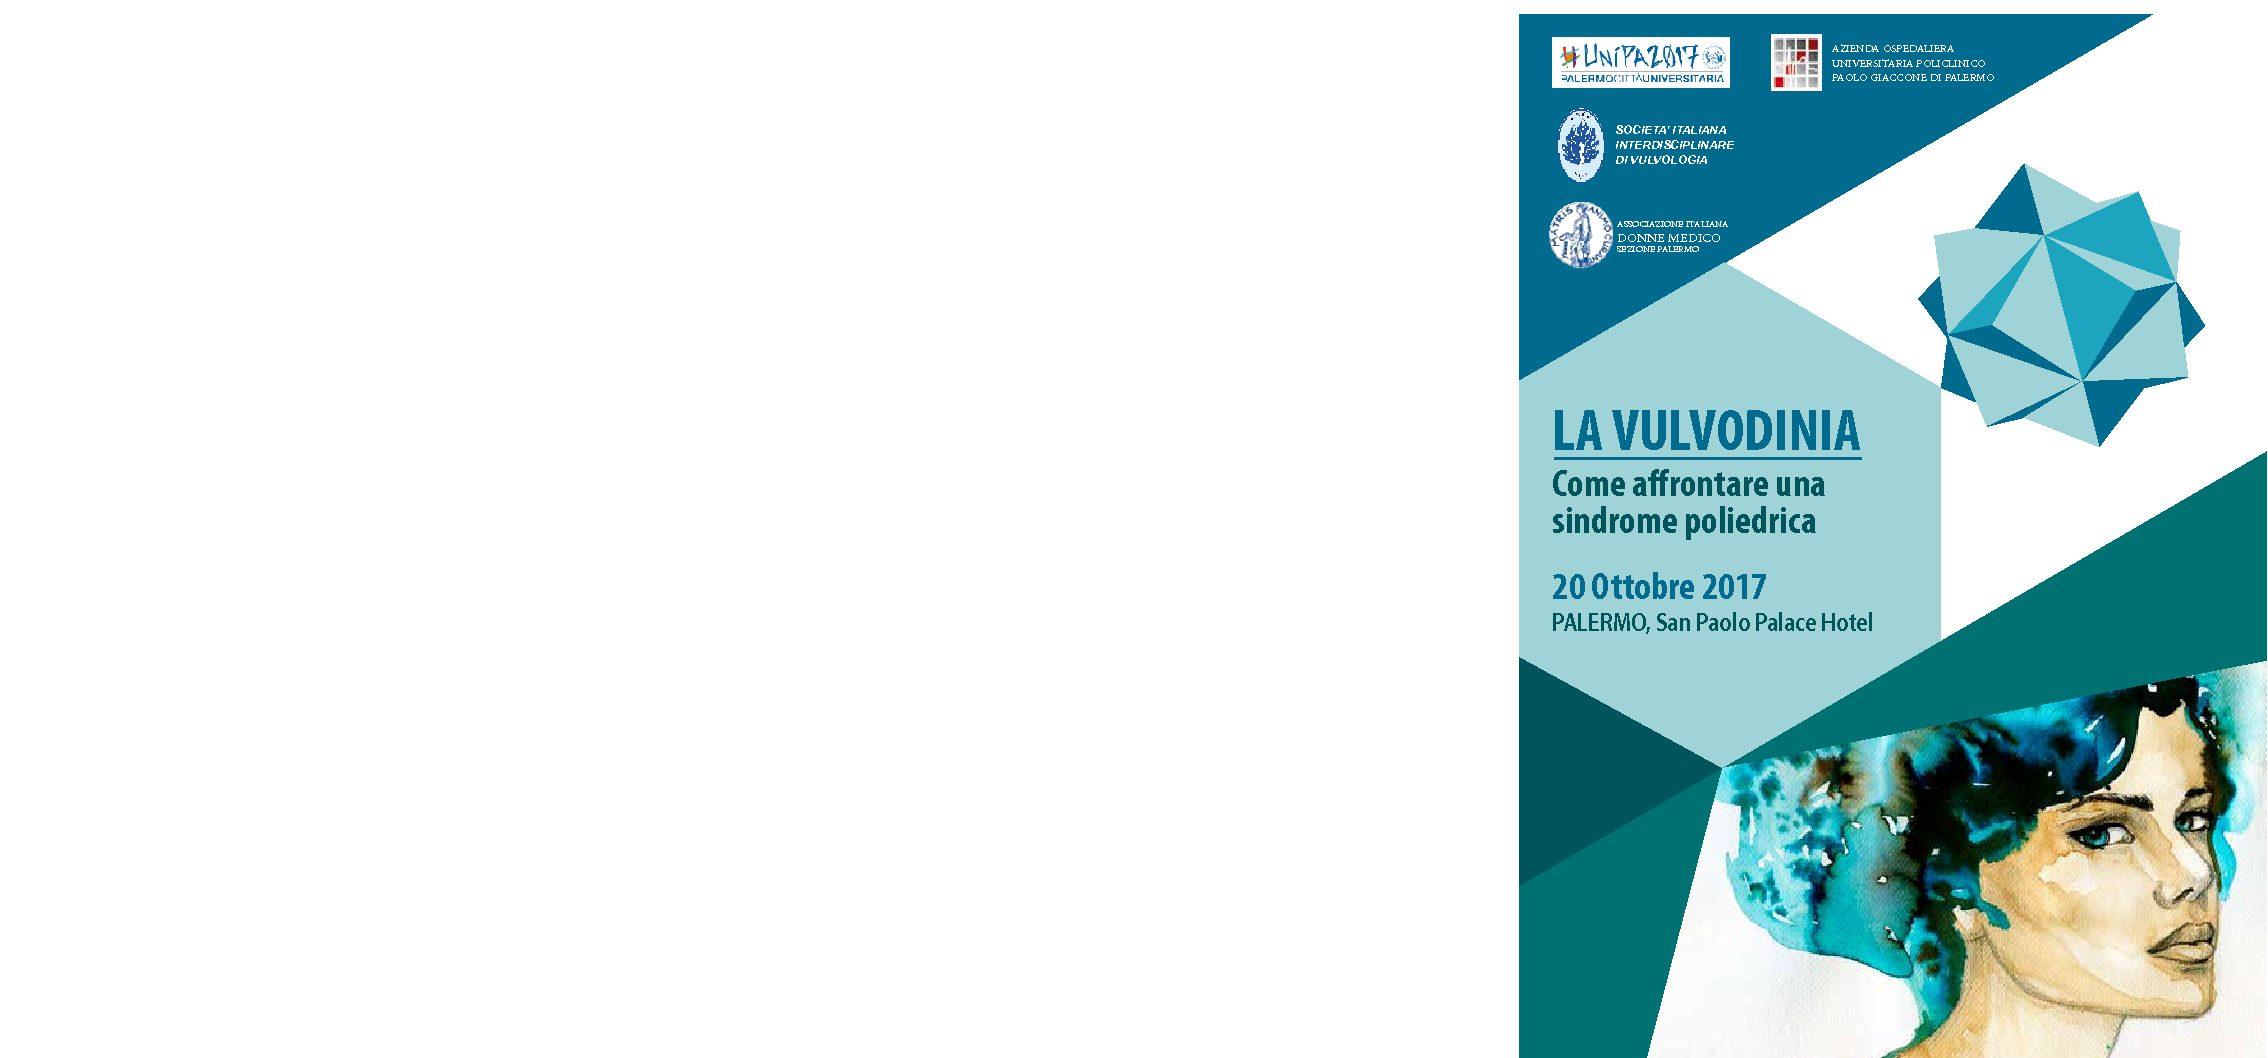 Programma Vulvodinia Palermo 20Ottobre2017 rev10 1 1 pdf - Programma_Vulvodinia_Palermo_20Ottobre2017_rev10 (1)